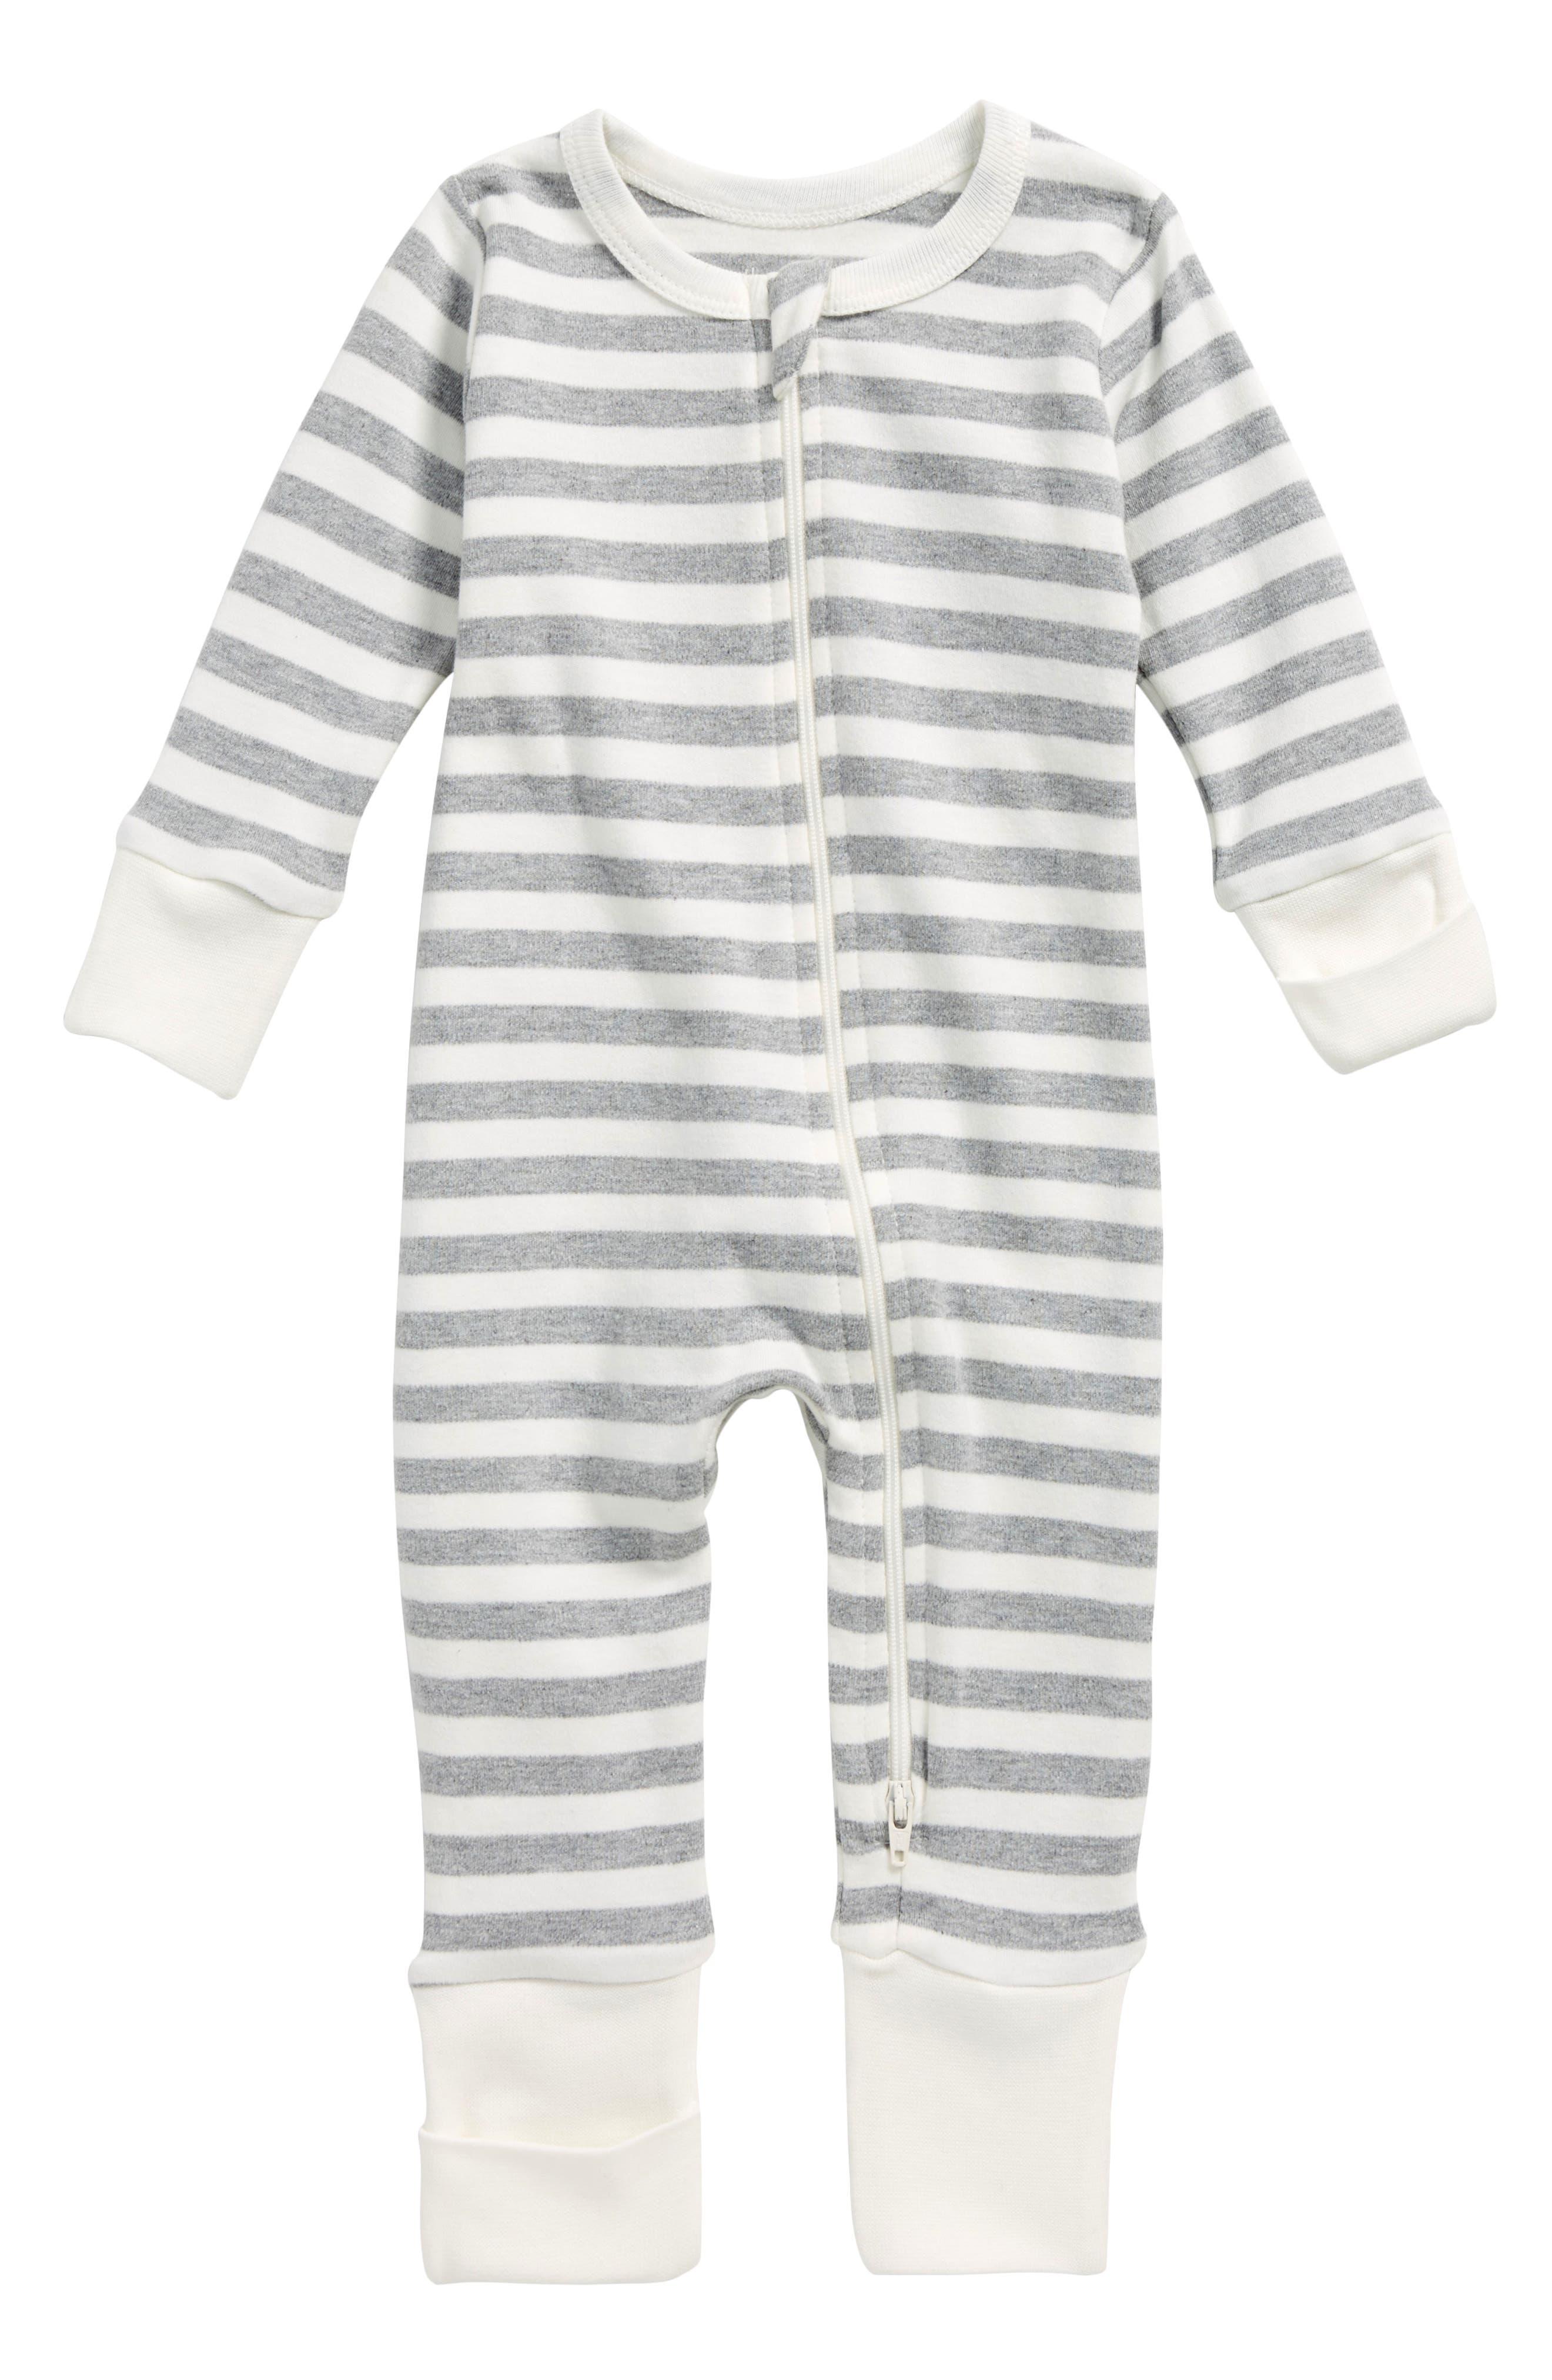 Stripe Organic Cotton Romper,                             Main thumbnail 1, color,                             Striped Grey/ Off White